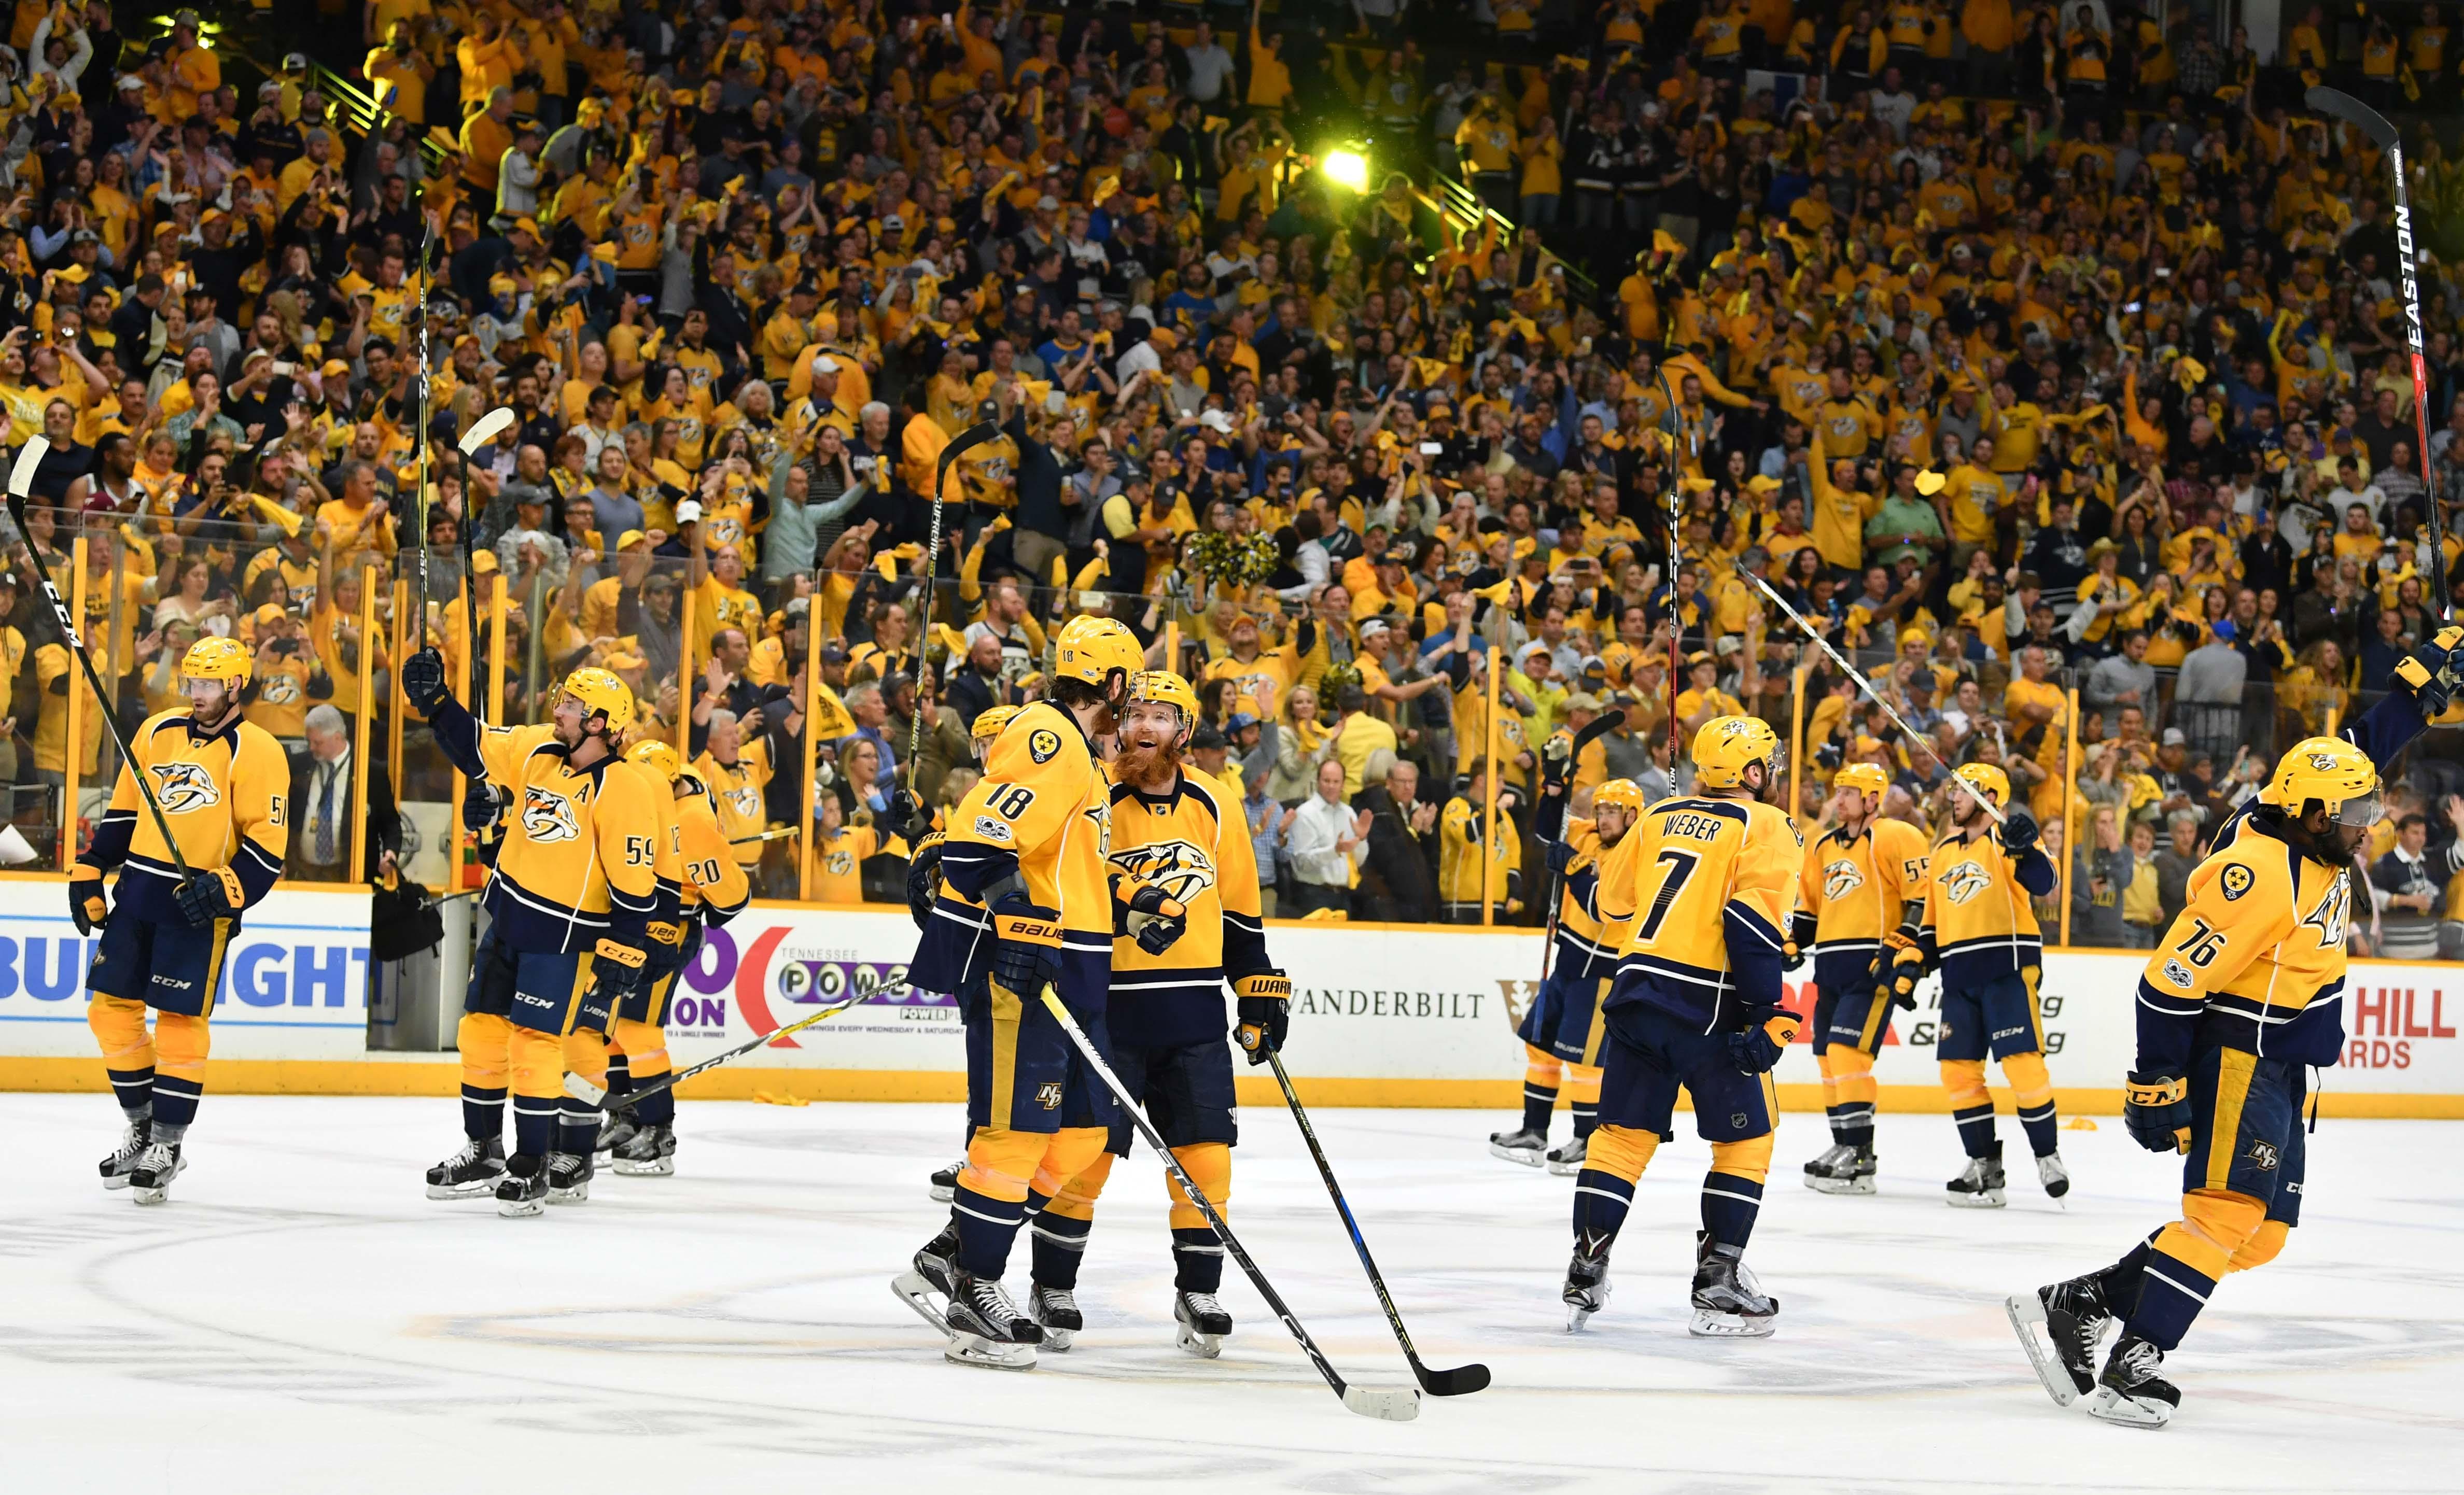 NHL: Stanley Cup Playoffs-St. Louis Blues at Nashville Predators